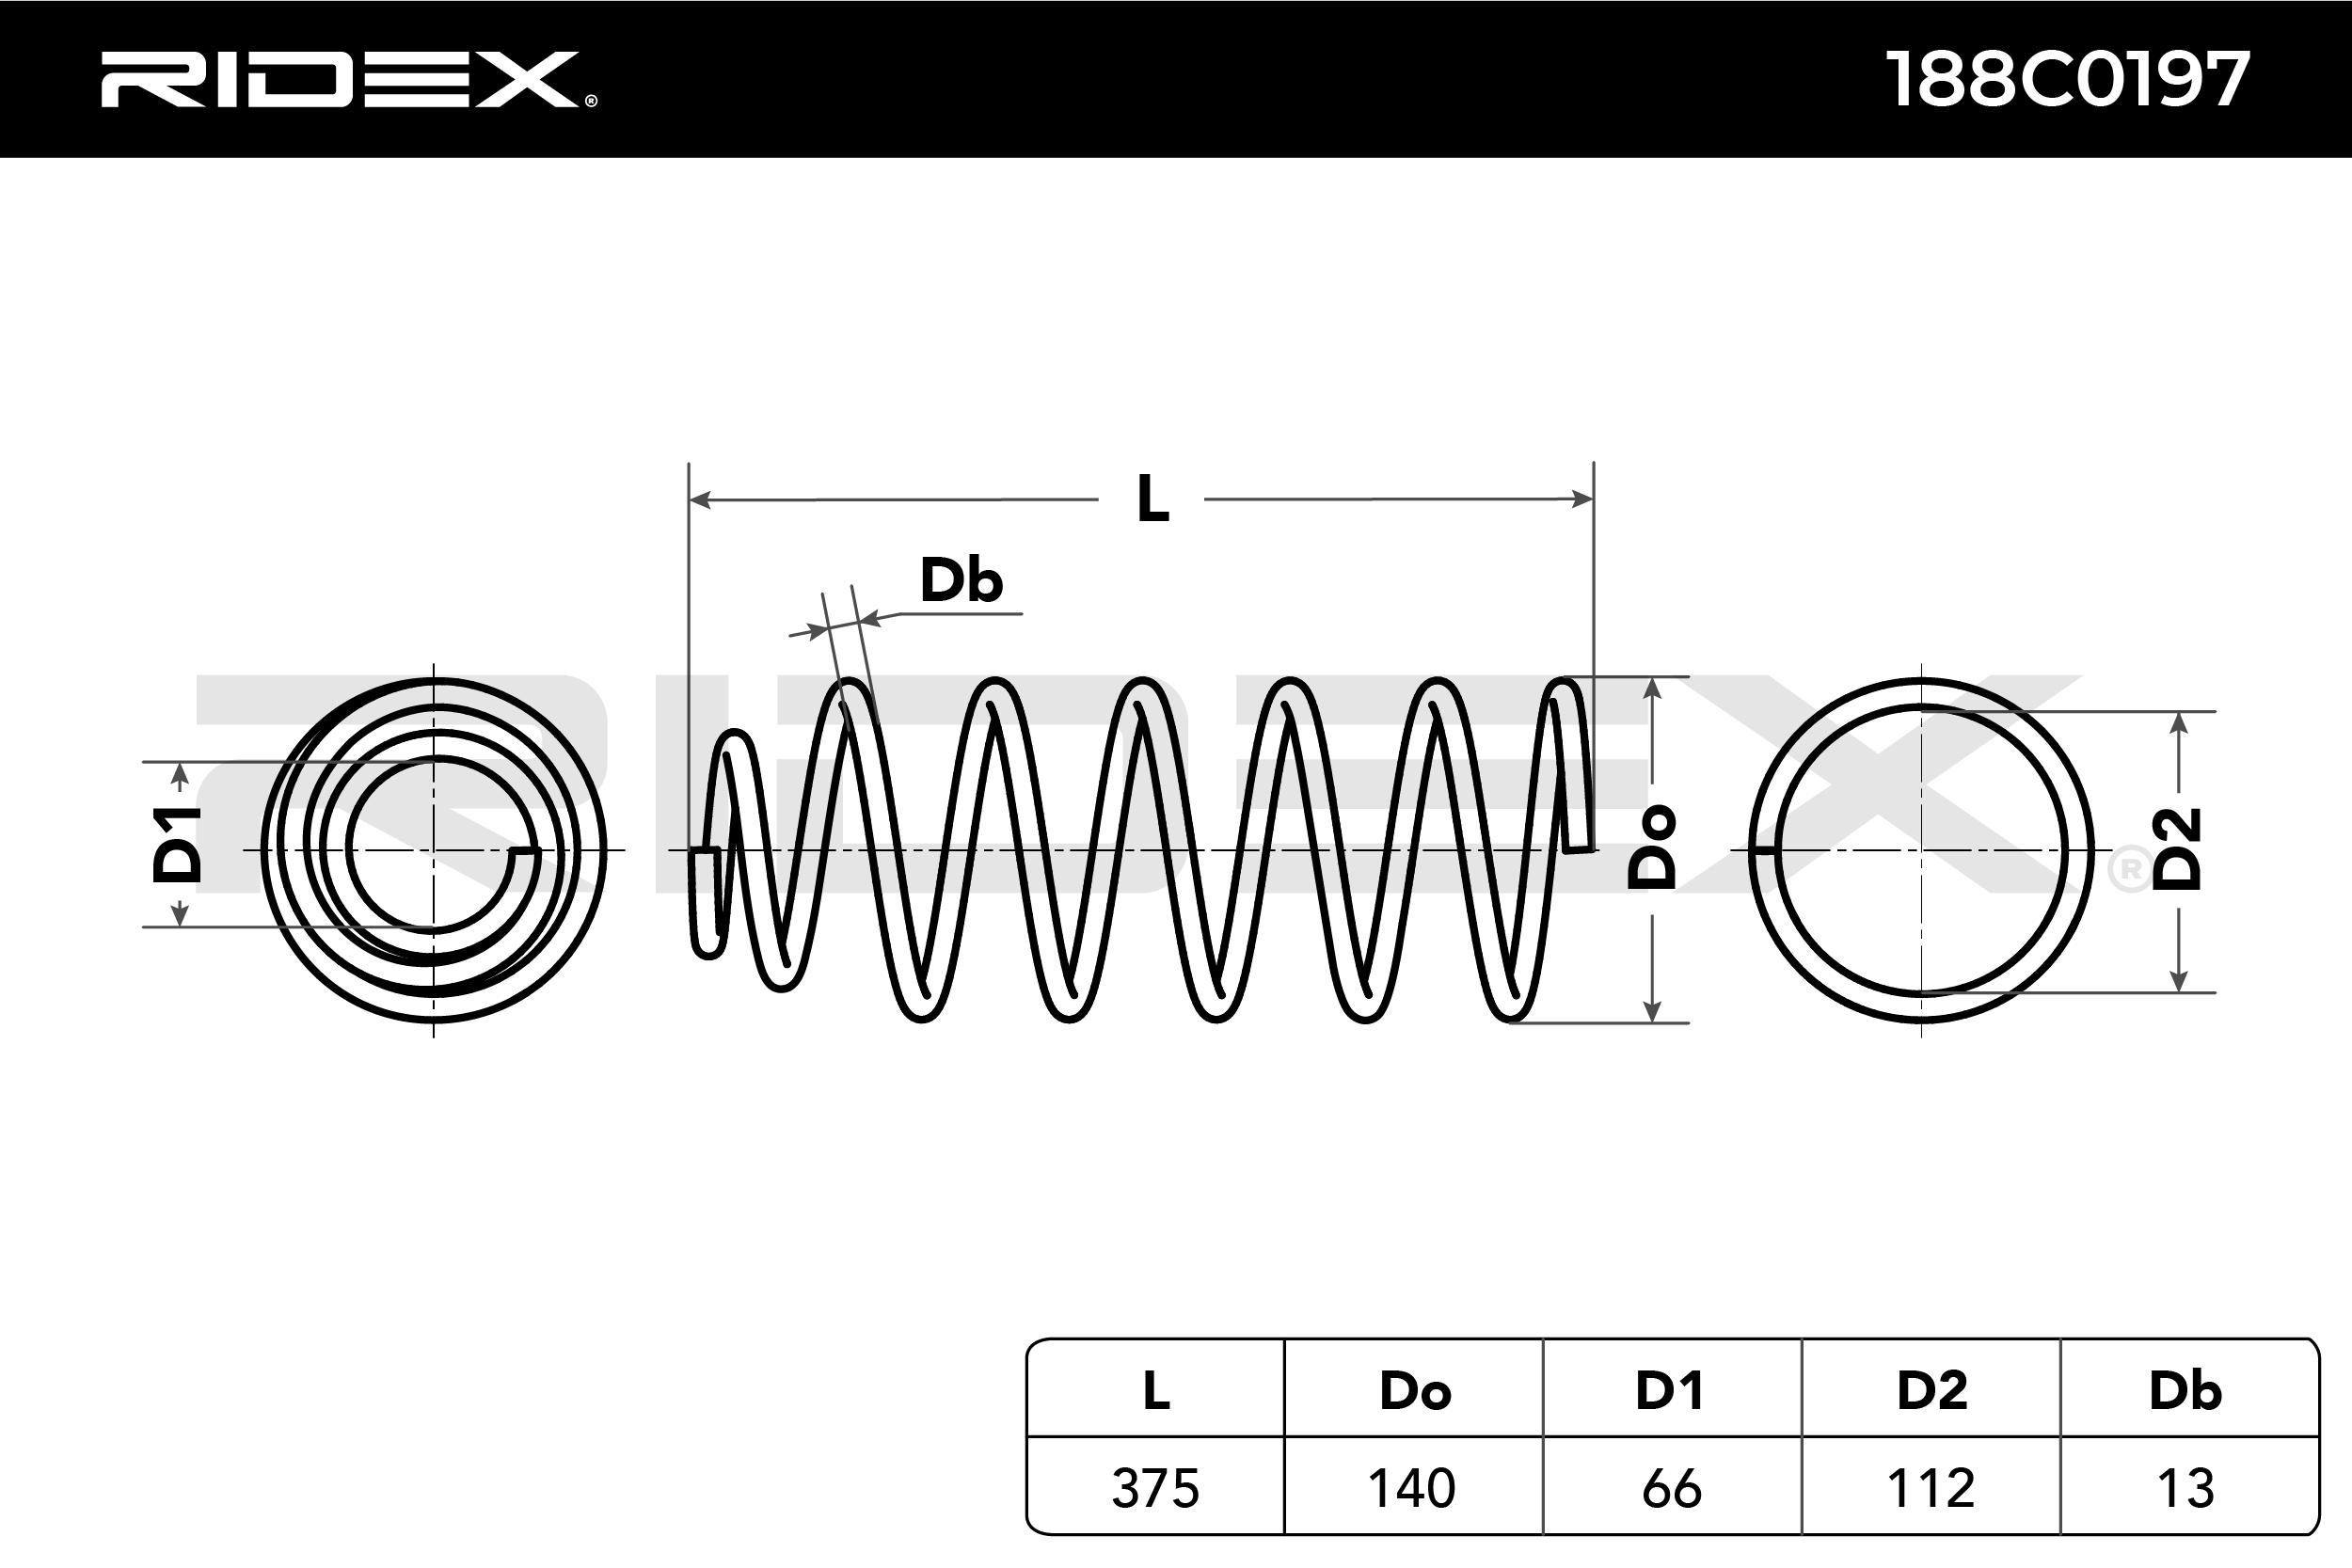 RIDEX Art. Nr 188C0197 günstig